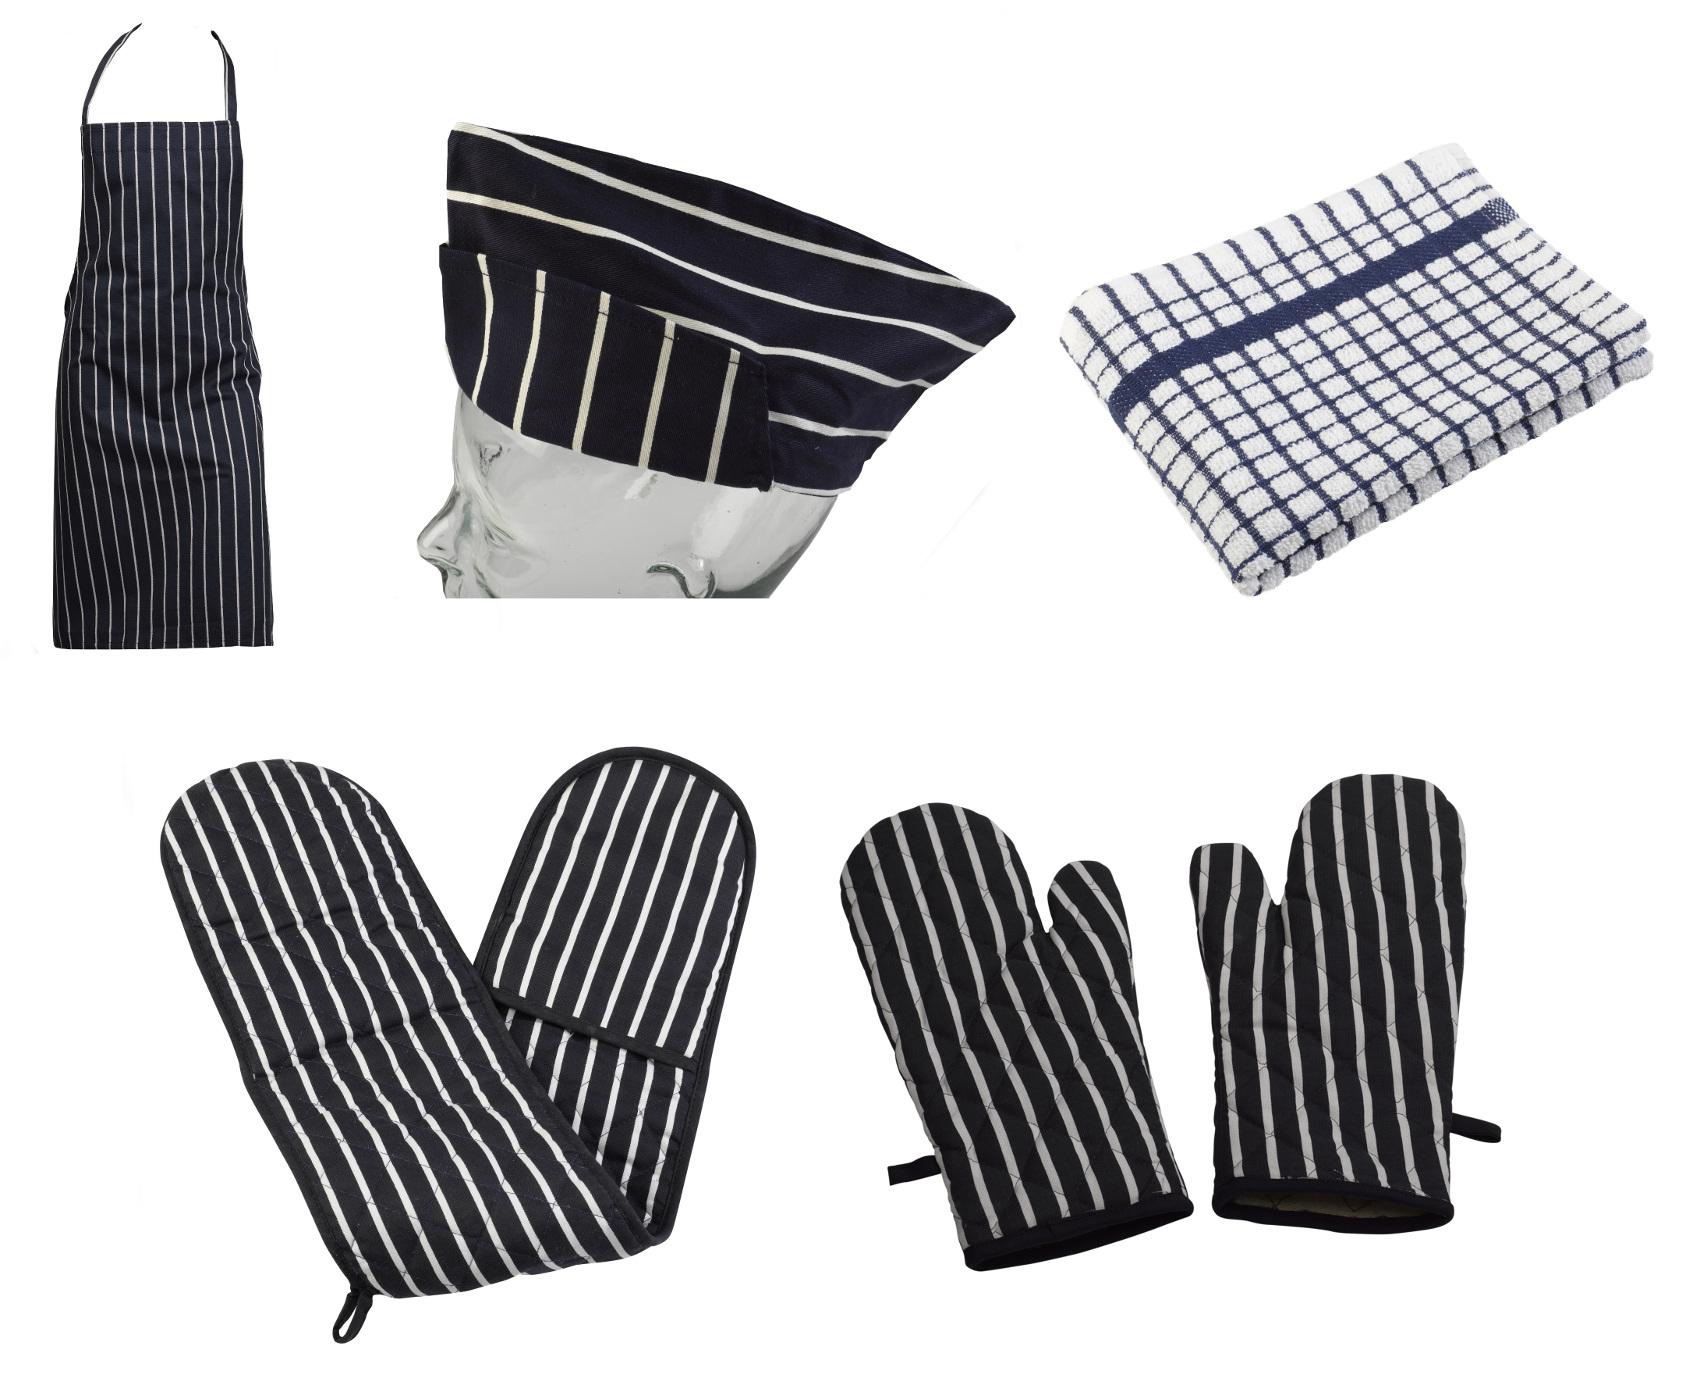 White apron ebay.ca - Image Is Loading 4 Piece Cotton Kitchen Linen Set Bib Apron